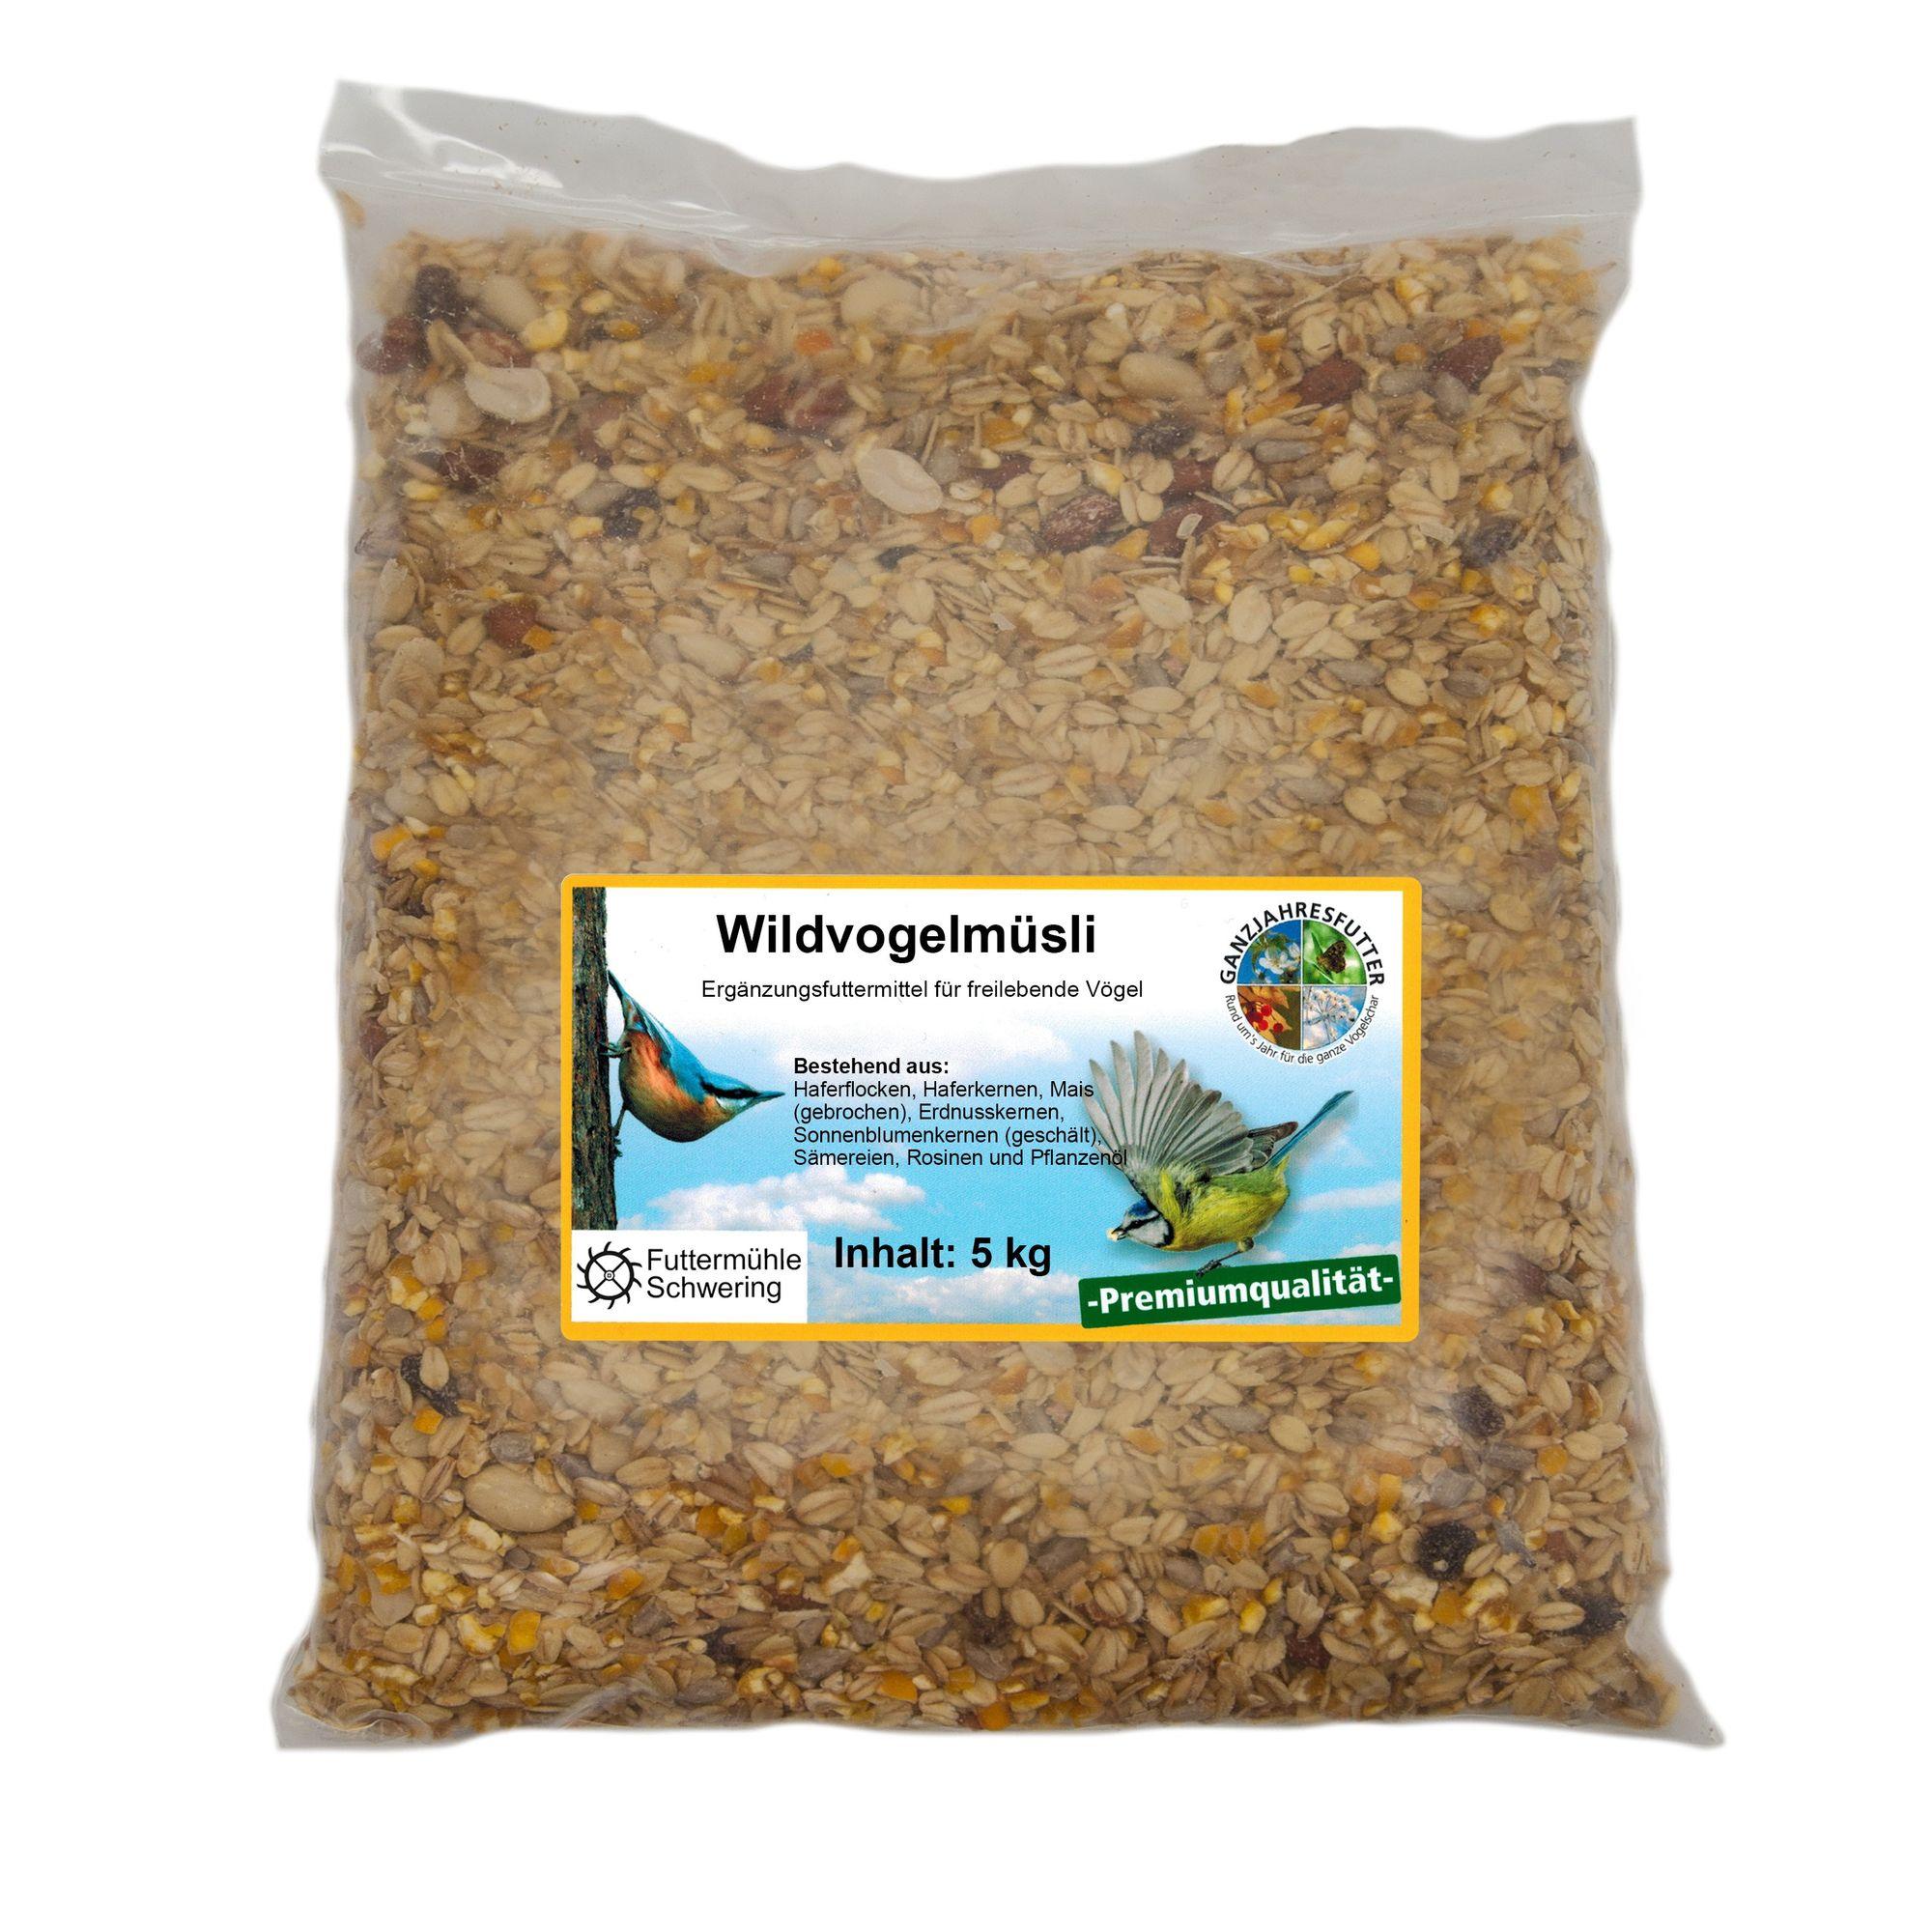 Wildvogelfutter Streupaket mit 5 Sorten Futter je 5kg